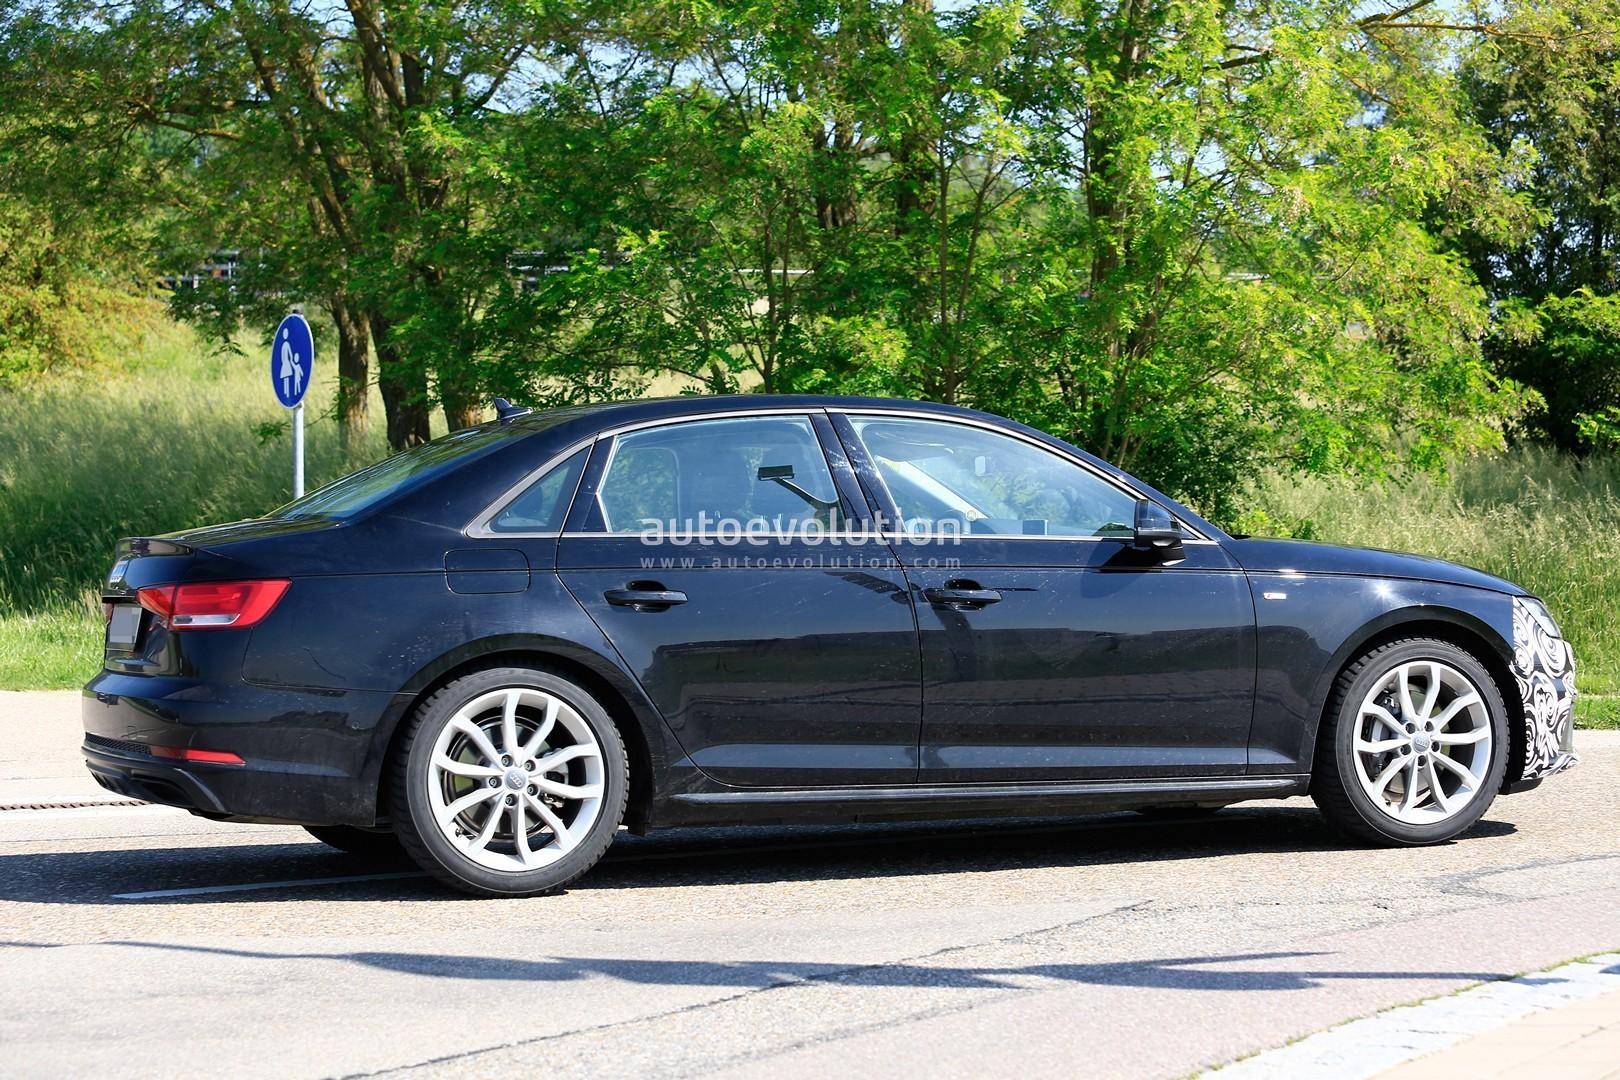 2020 Audi A4 Facelift New Spyshots Show All the Details ...